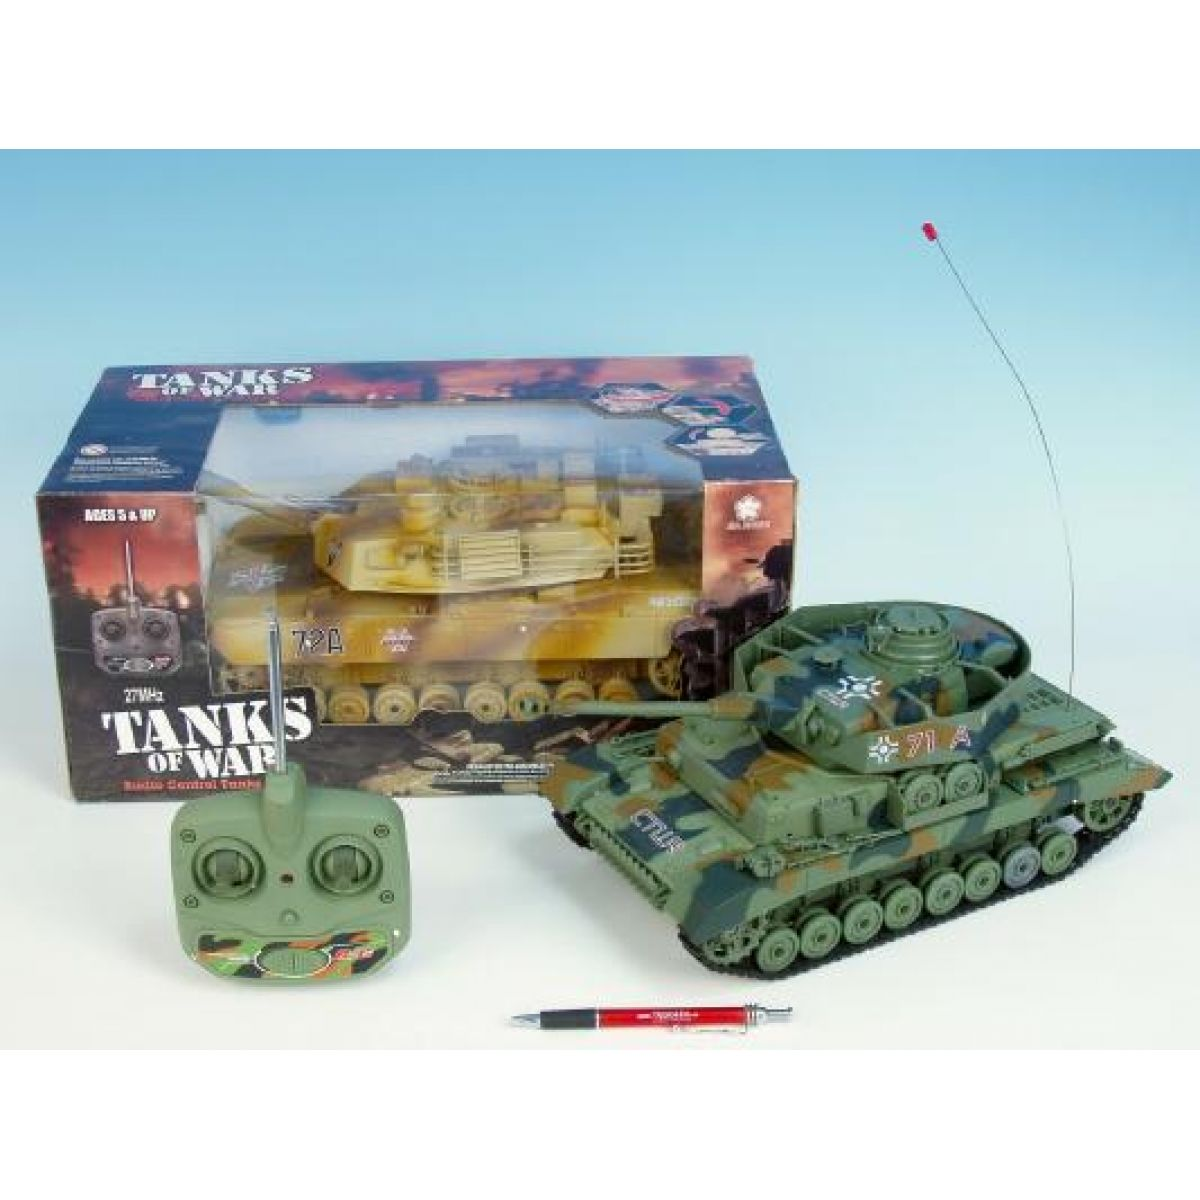 Teddies R/C Tank